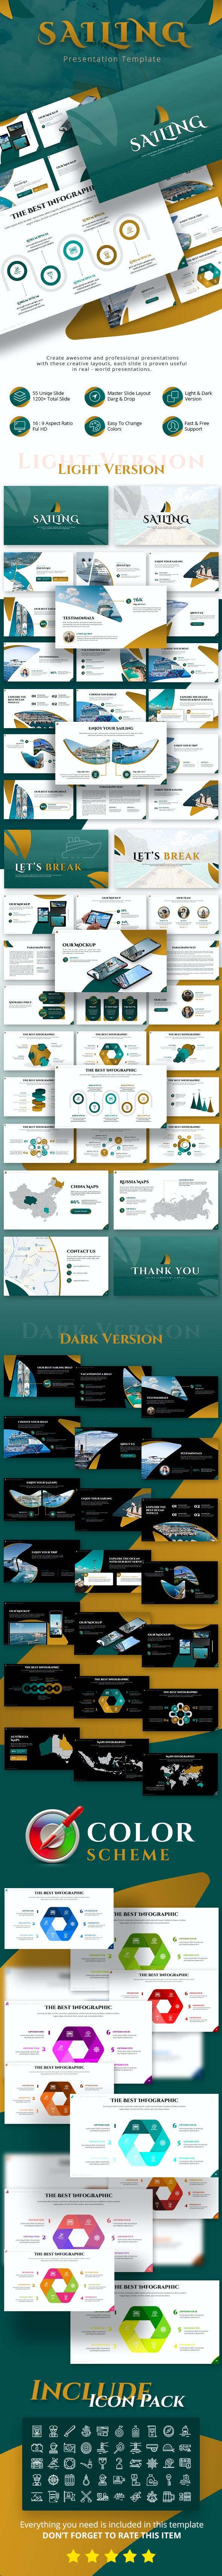 Sailing Ocean Presentation Template - Creative PowerPoint Templates